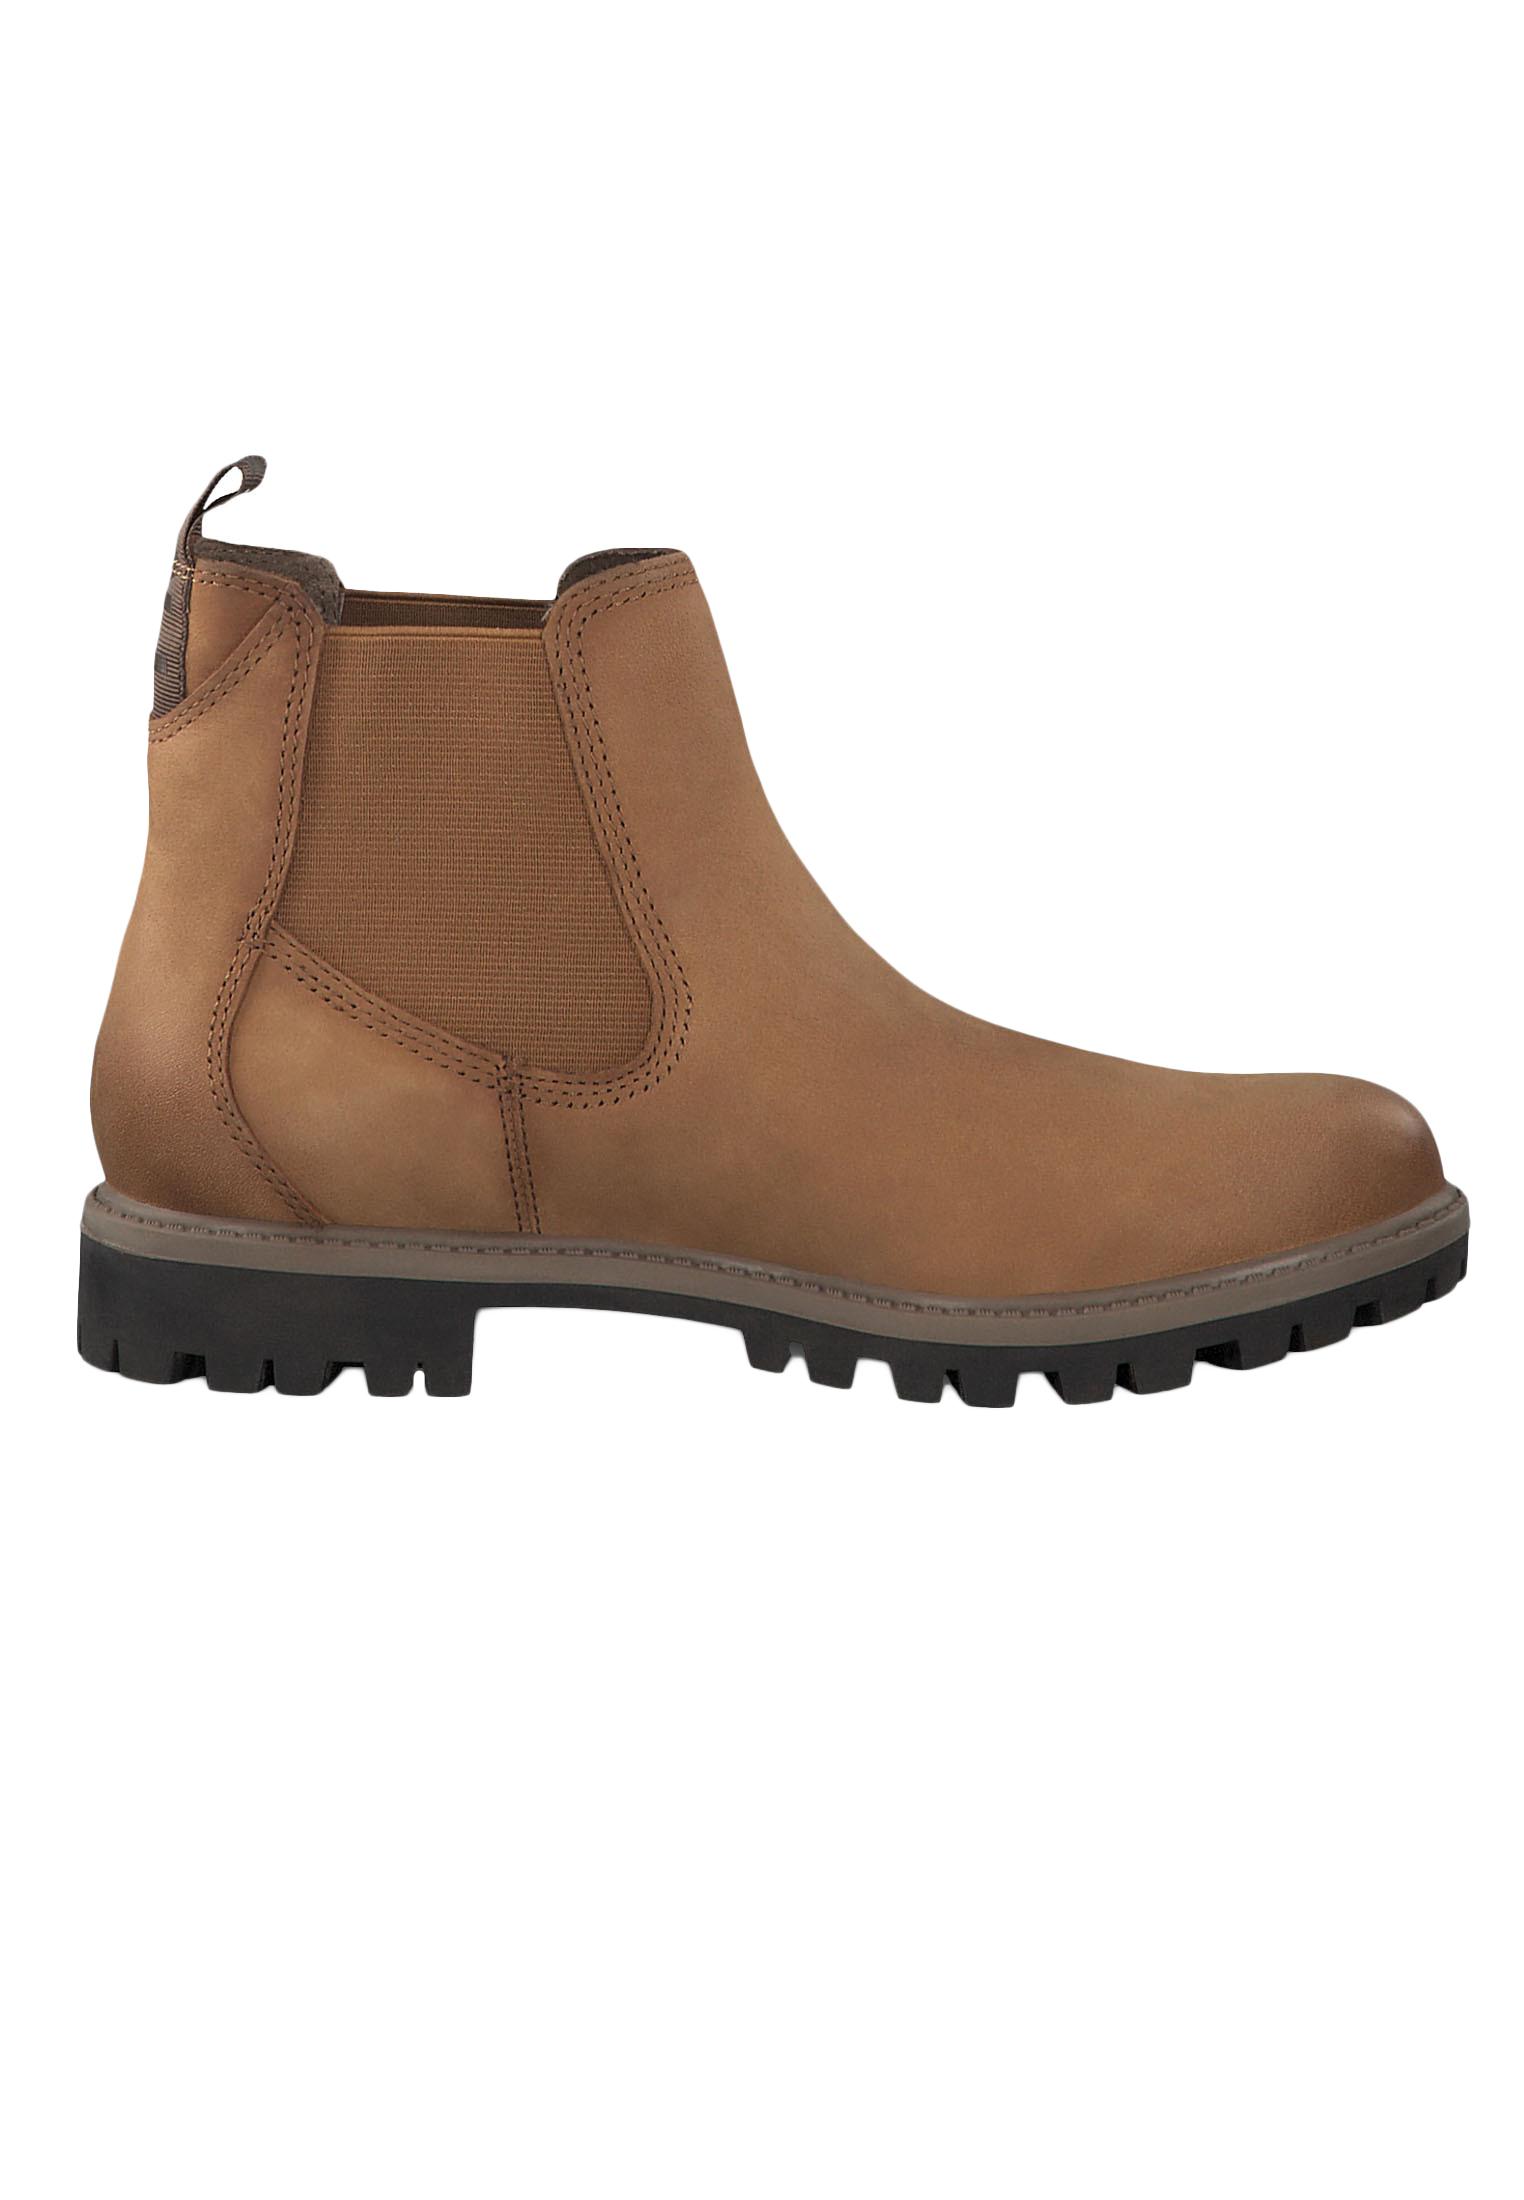 Tamaris 1 25401 23 440 Damen Stiefelette Chelsea Boots Nut